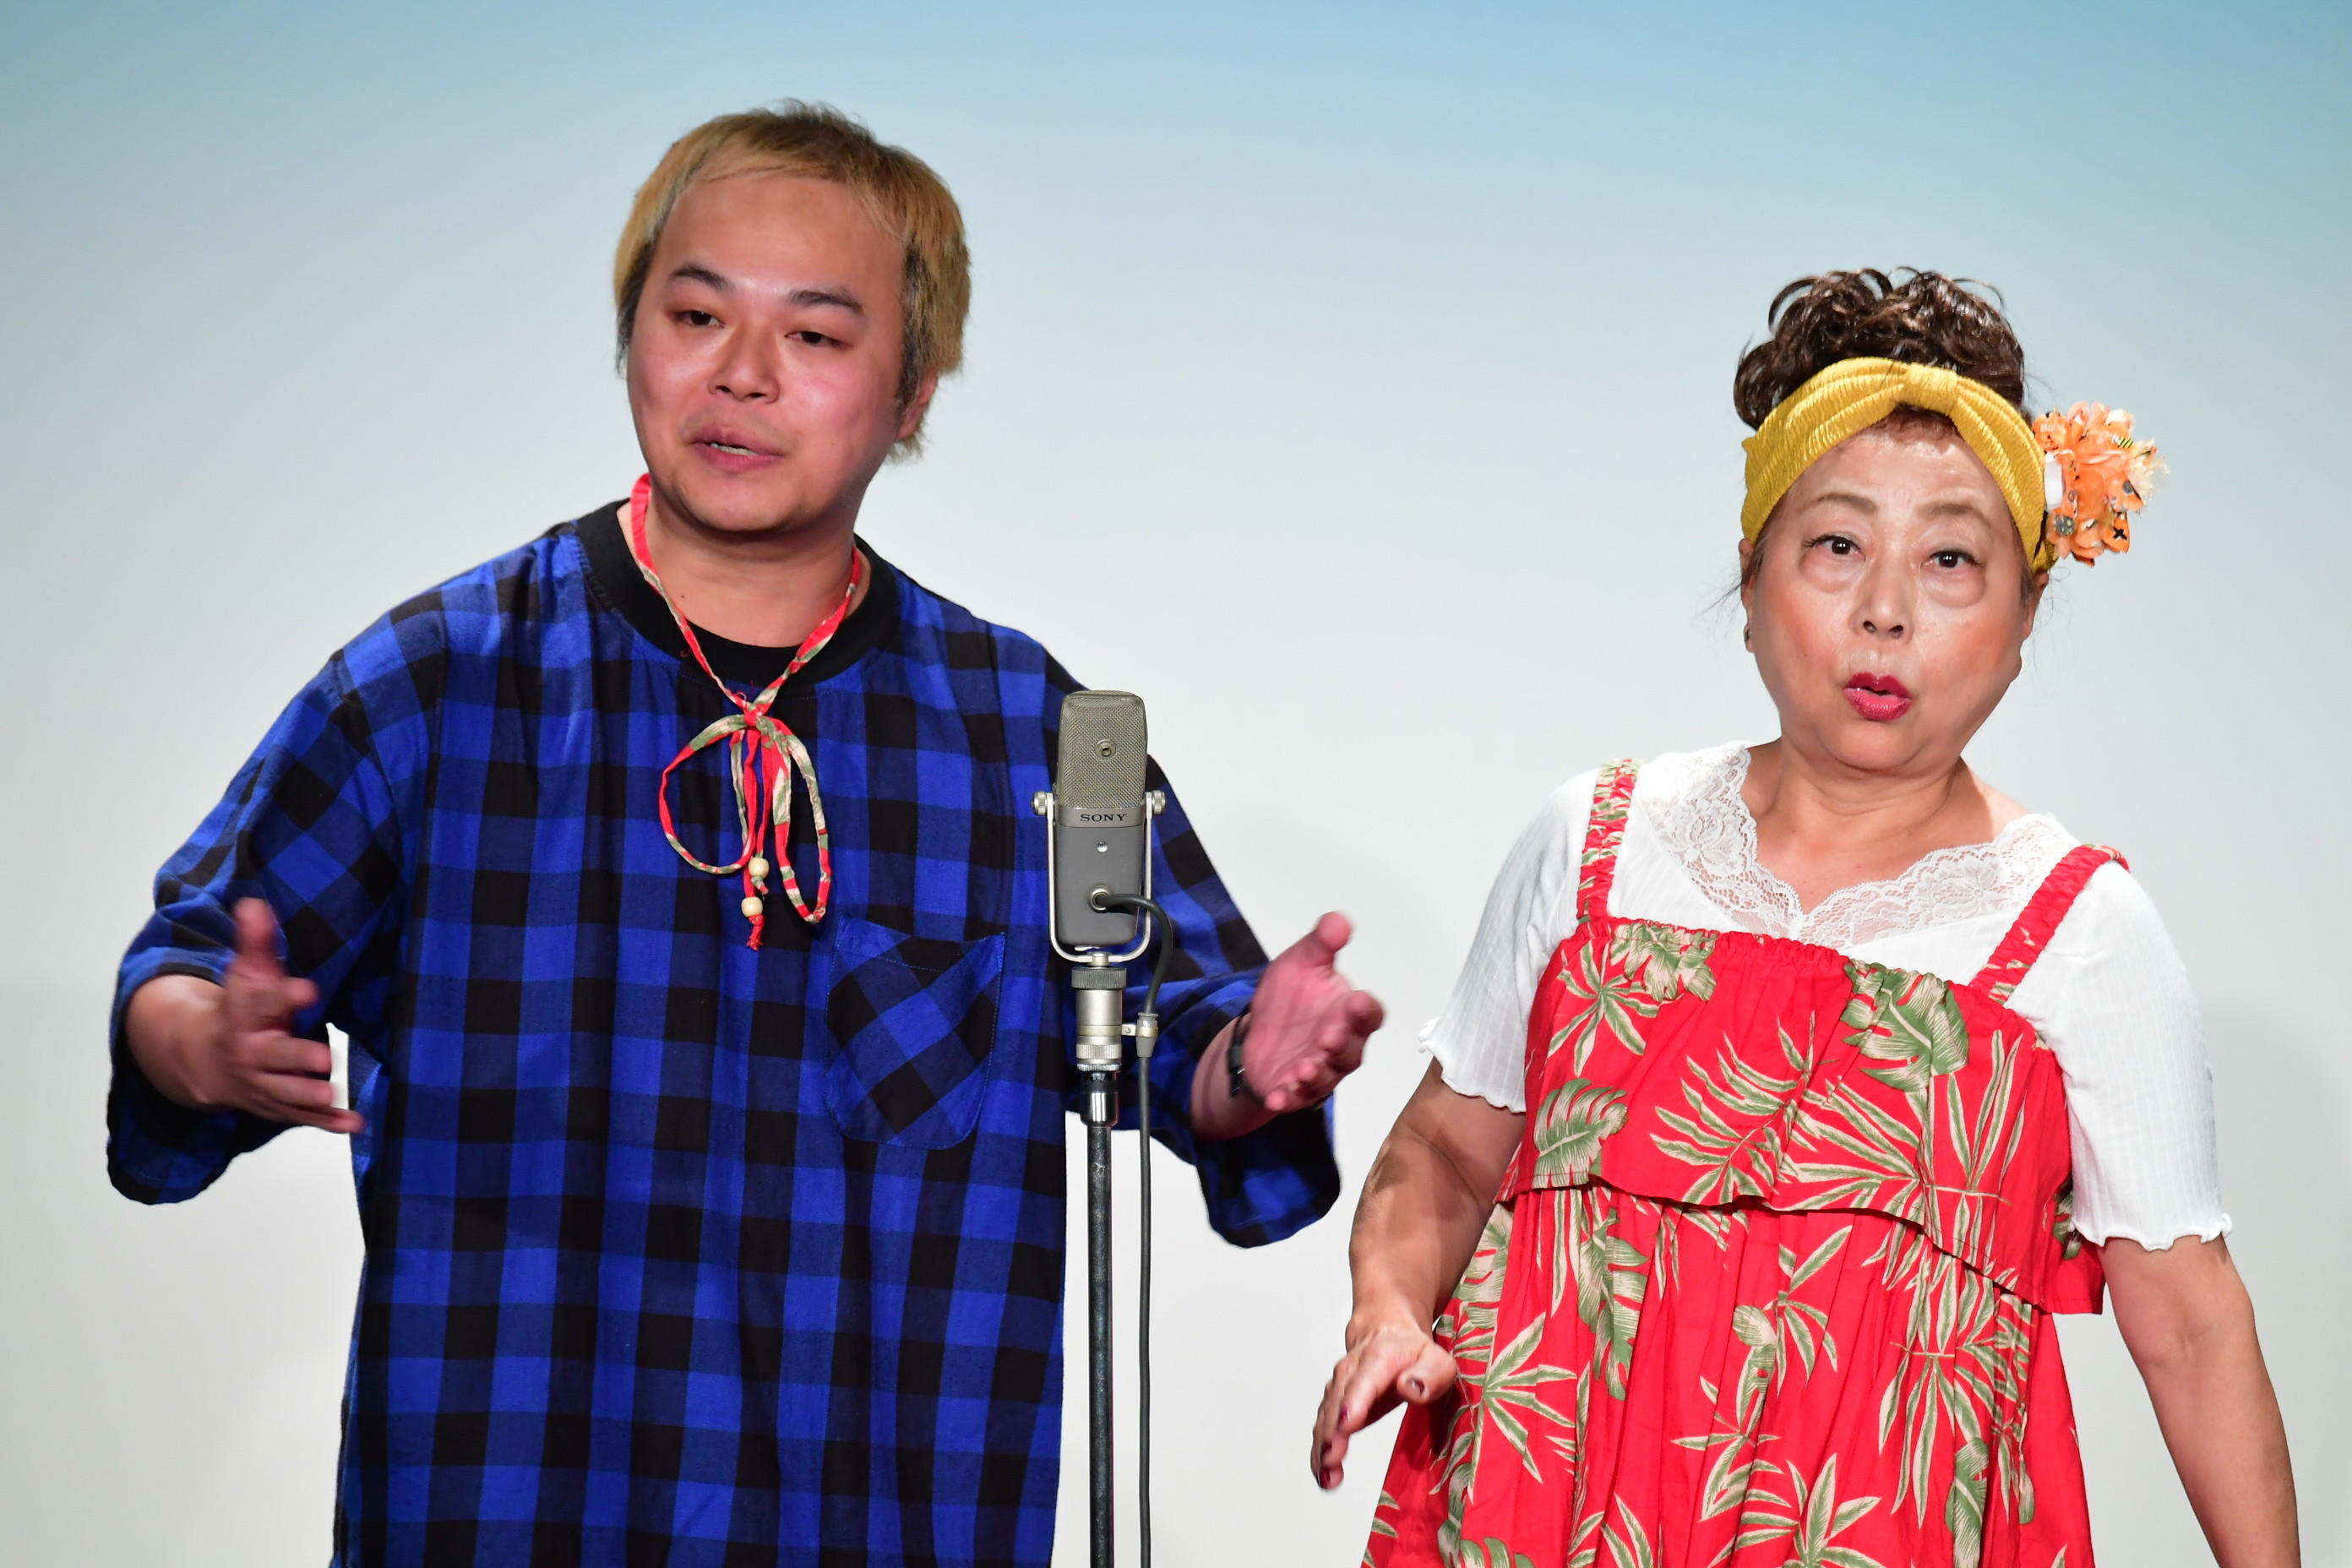 http://news.yoshimoto.co.jp/20181030225810-106444e76ebcd24e249620f847d9c99c054bdf84.jpg